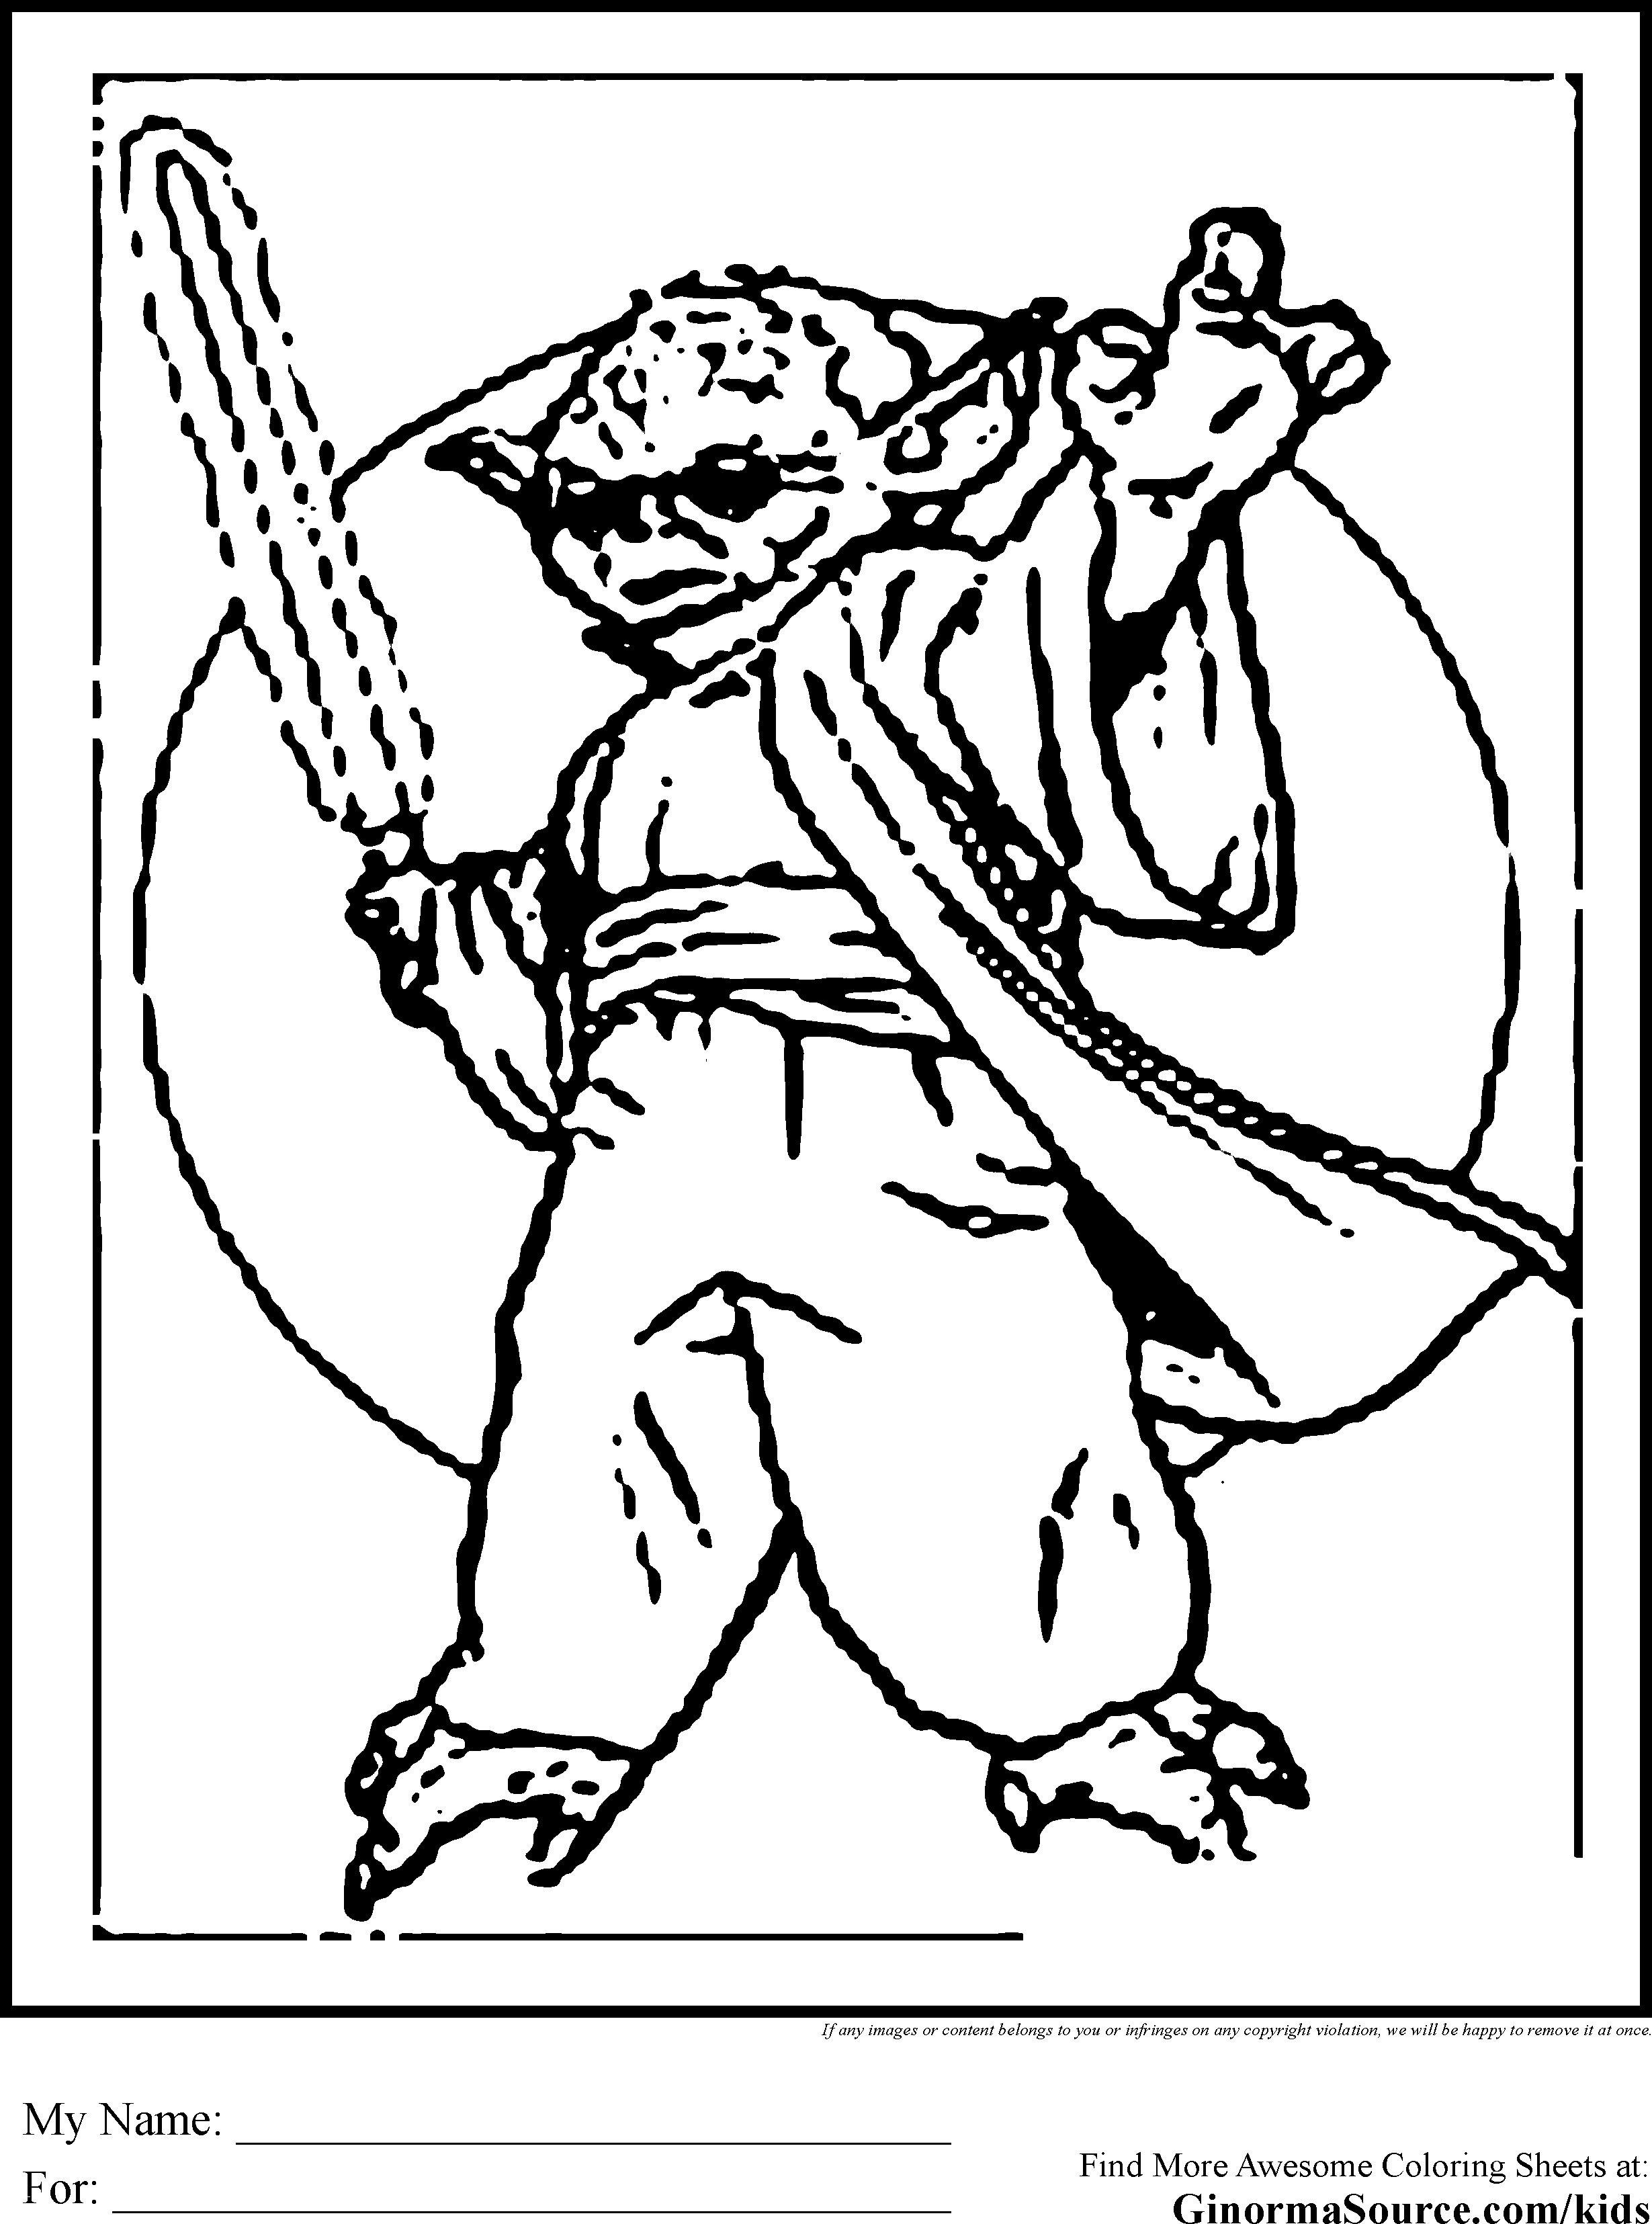 Robin Hood Ausmalbild Inspirierend Yoda Ausmalbilder Elegant Star Wars Printable Coloring Pages Fresh Fotografieren